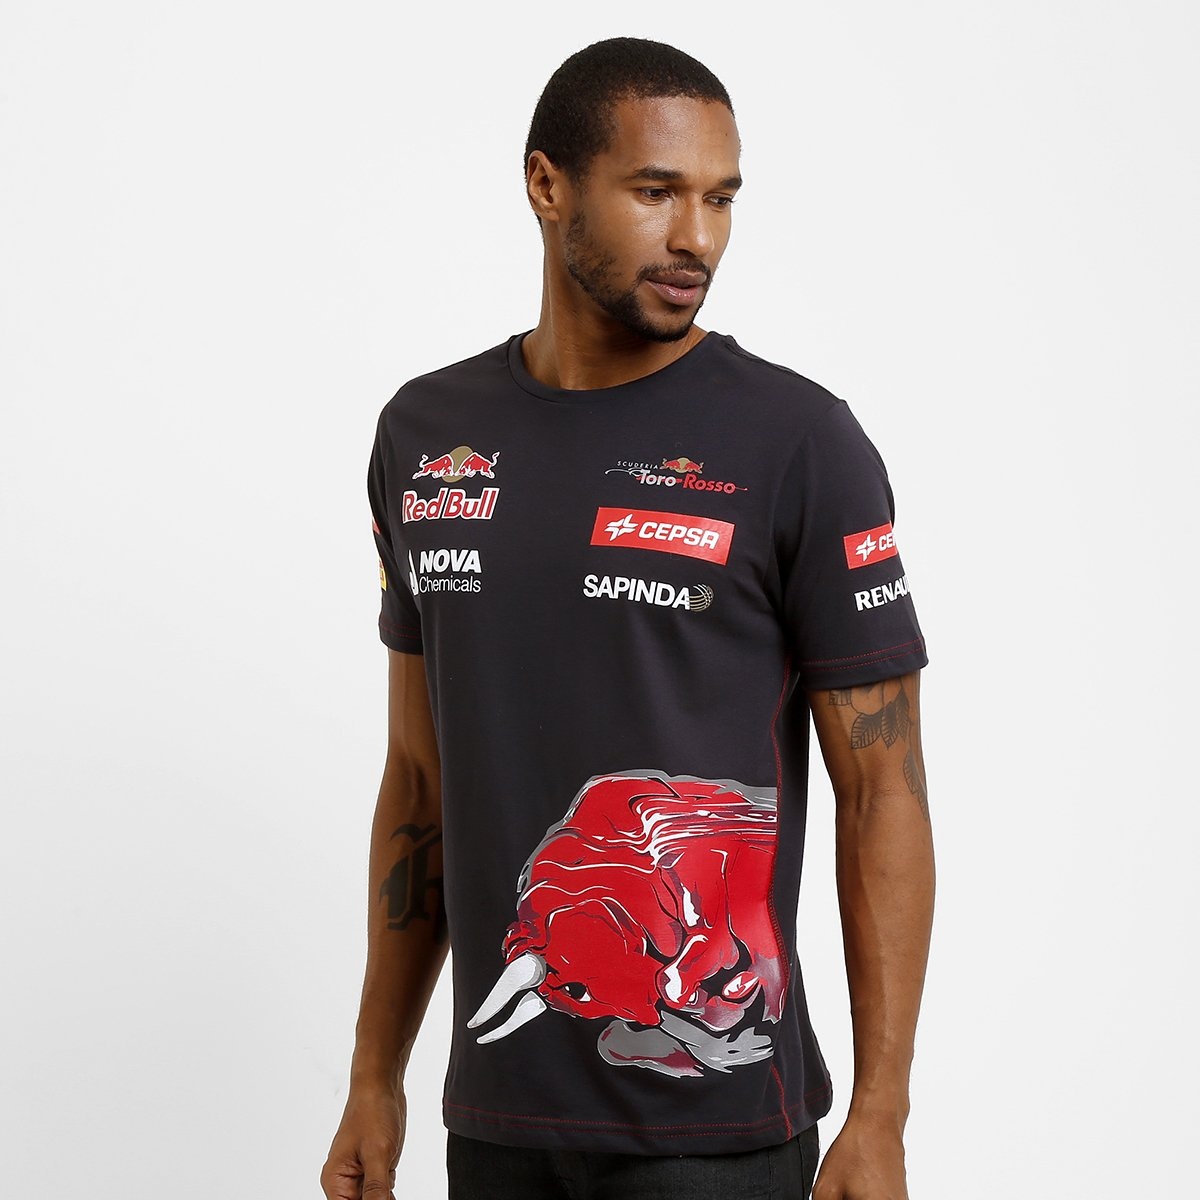 d2bc81fb9e4da Camiseta Red Bull Team Wear - Compre Agora